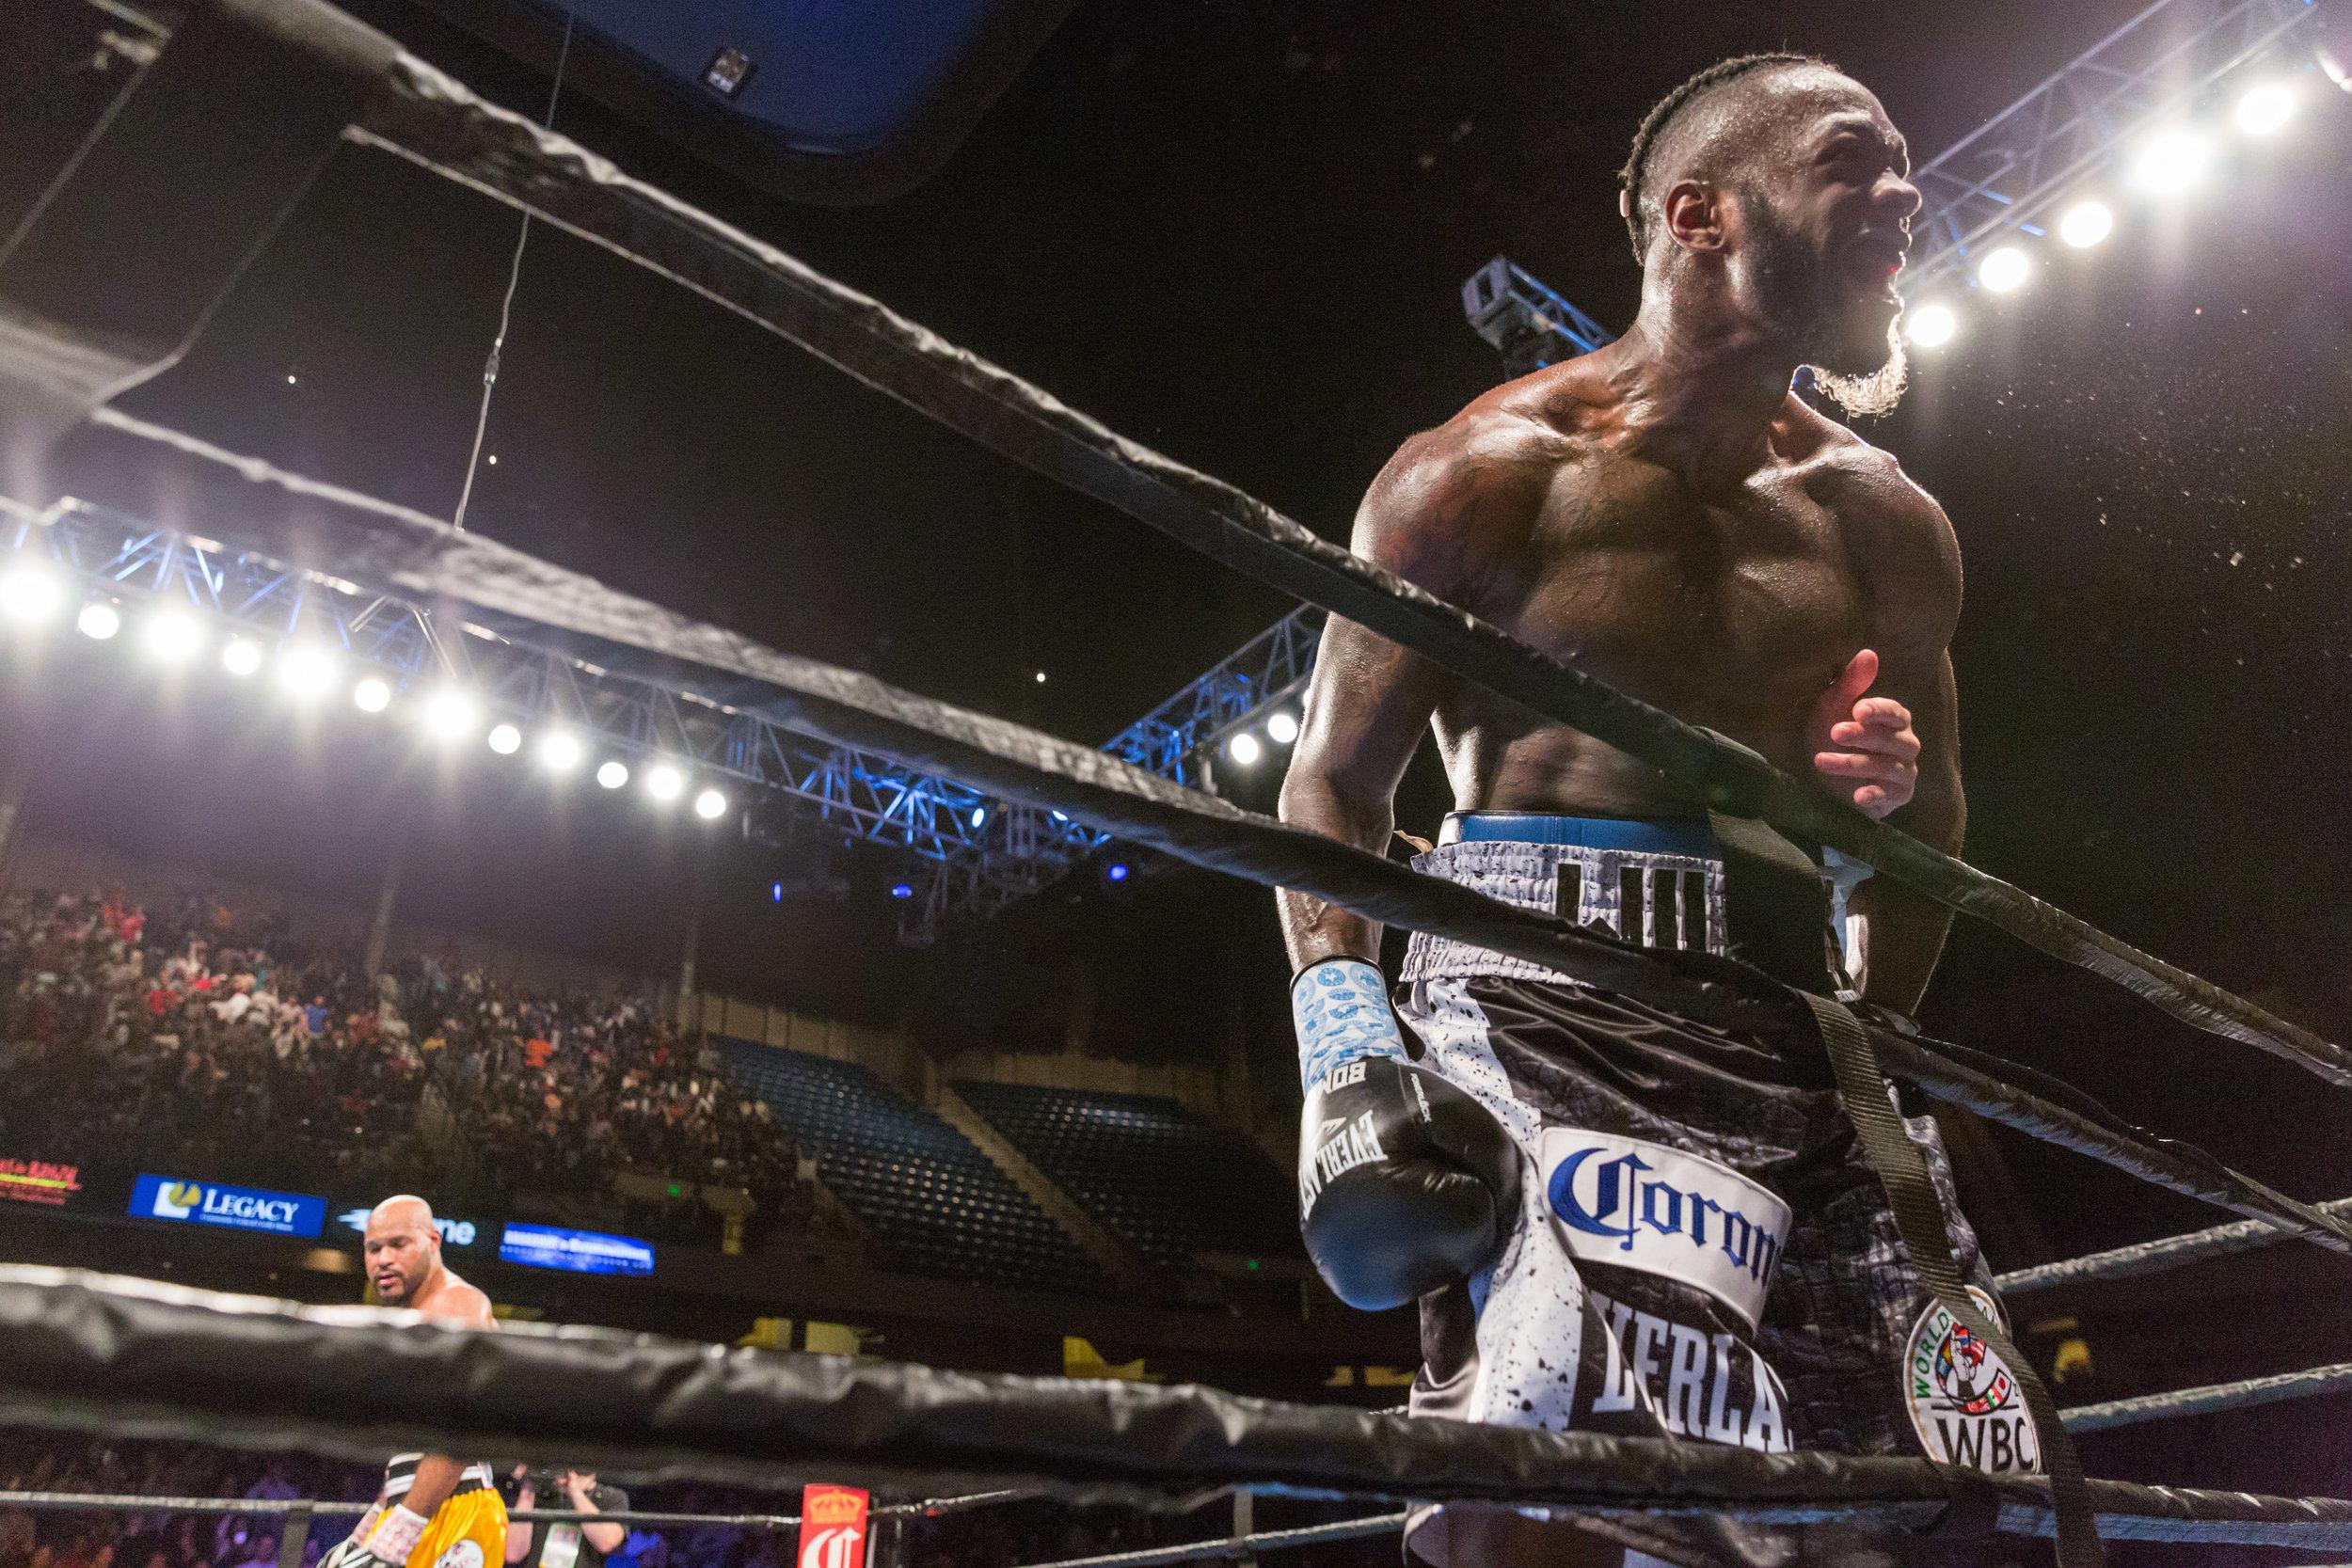 Deontay Wilder vs Gerald Washington - February 25_ 2017_02_25_2017_Fight_Ryan Hafey _ Premier Boxing Champions15.jpg